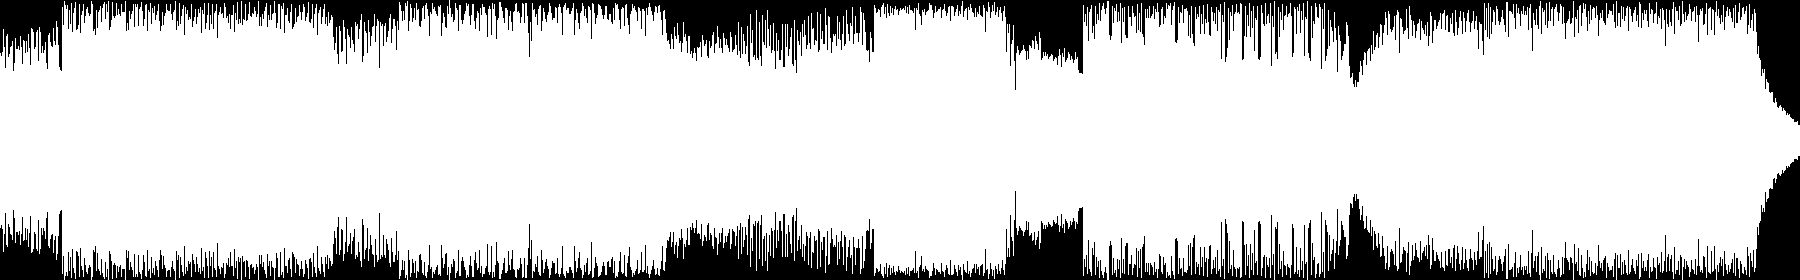 Piña Colada audio waveform